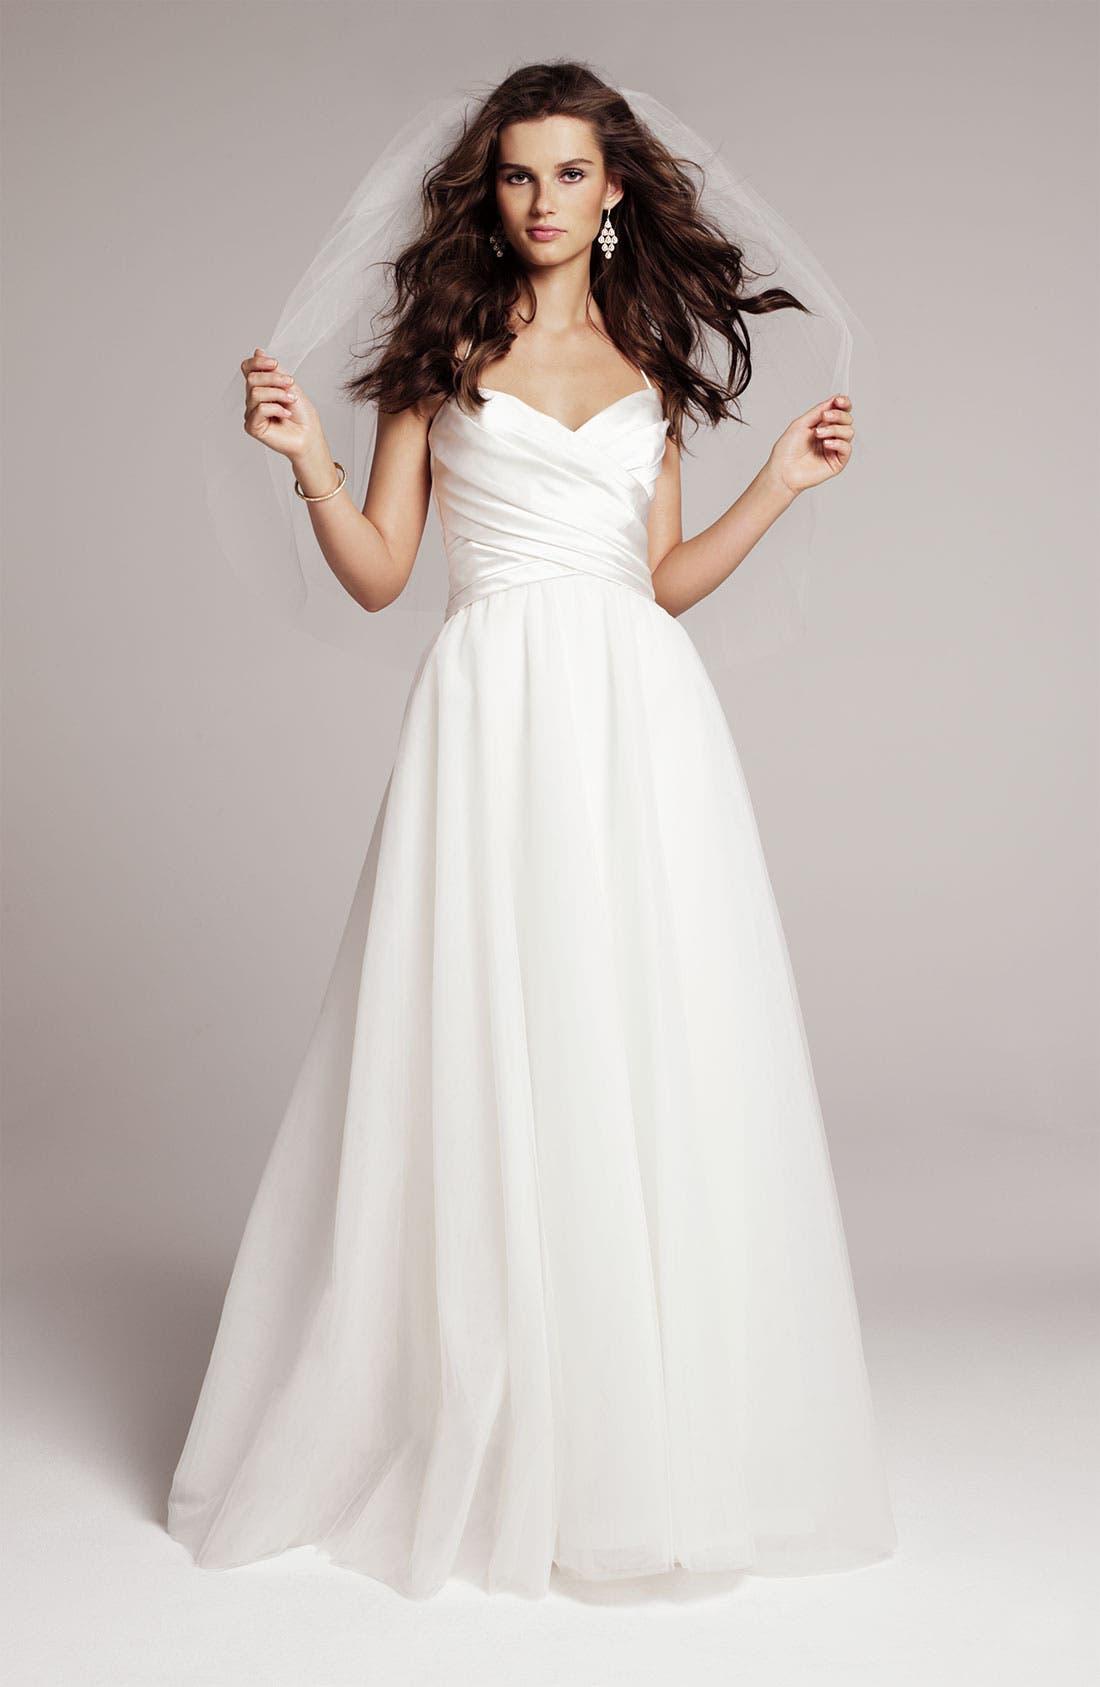 Main Image - Nouvelle Amsale Gown & Accessories